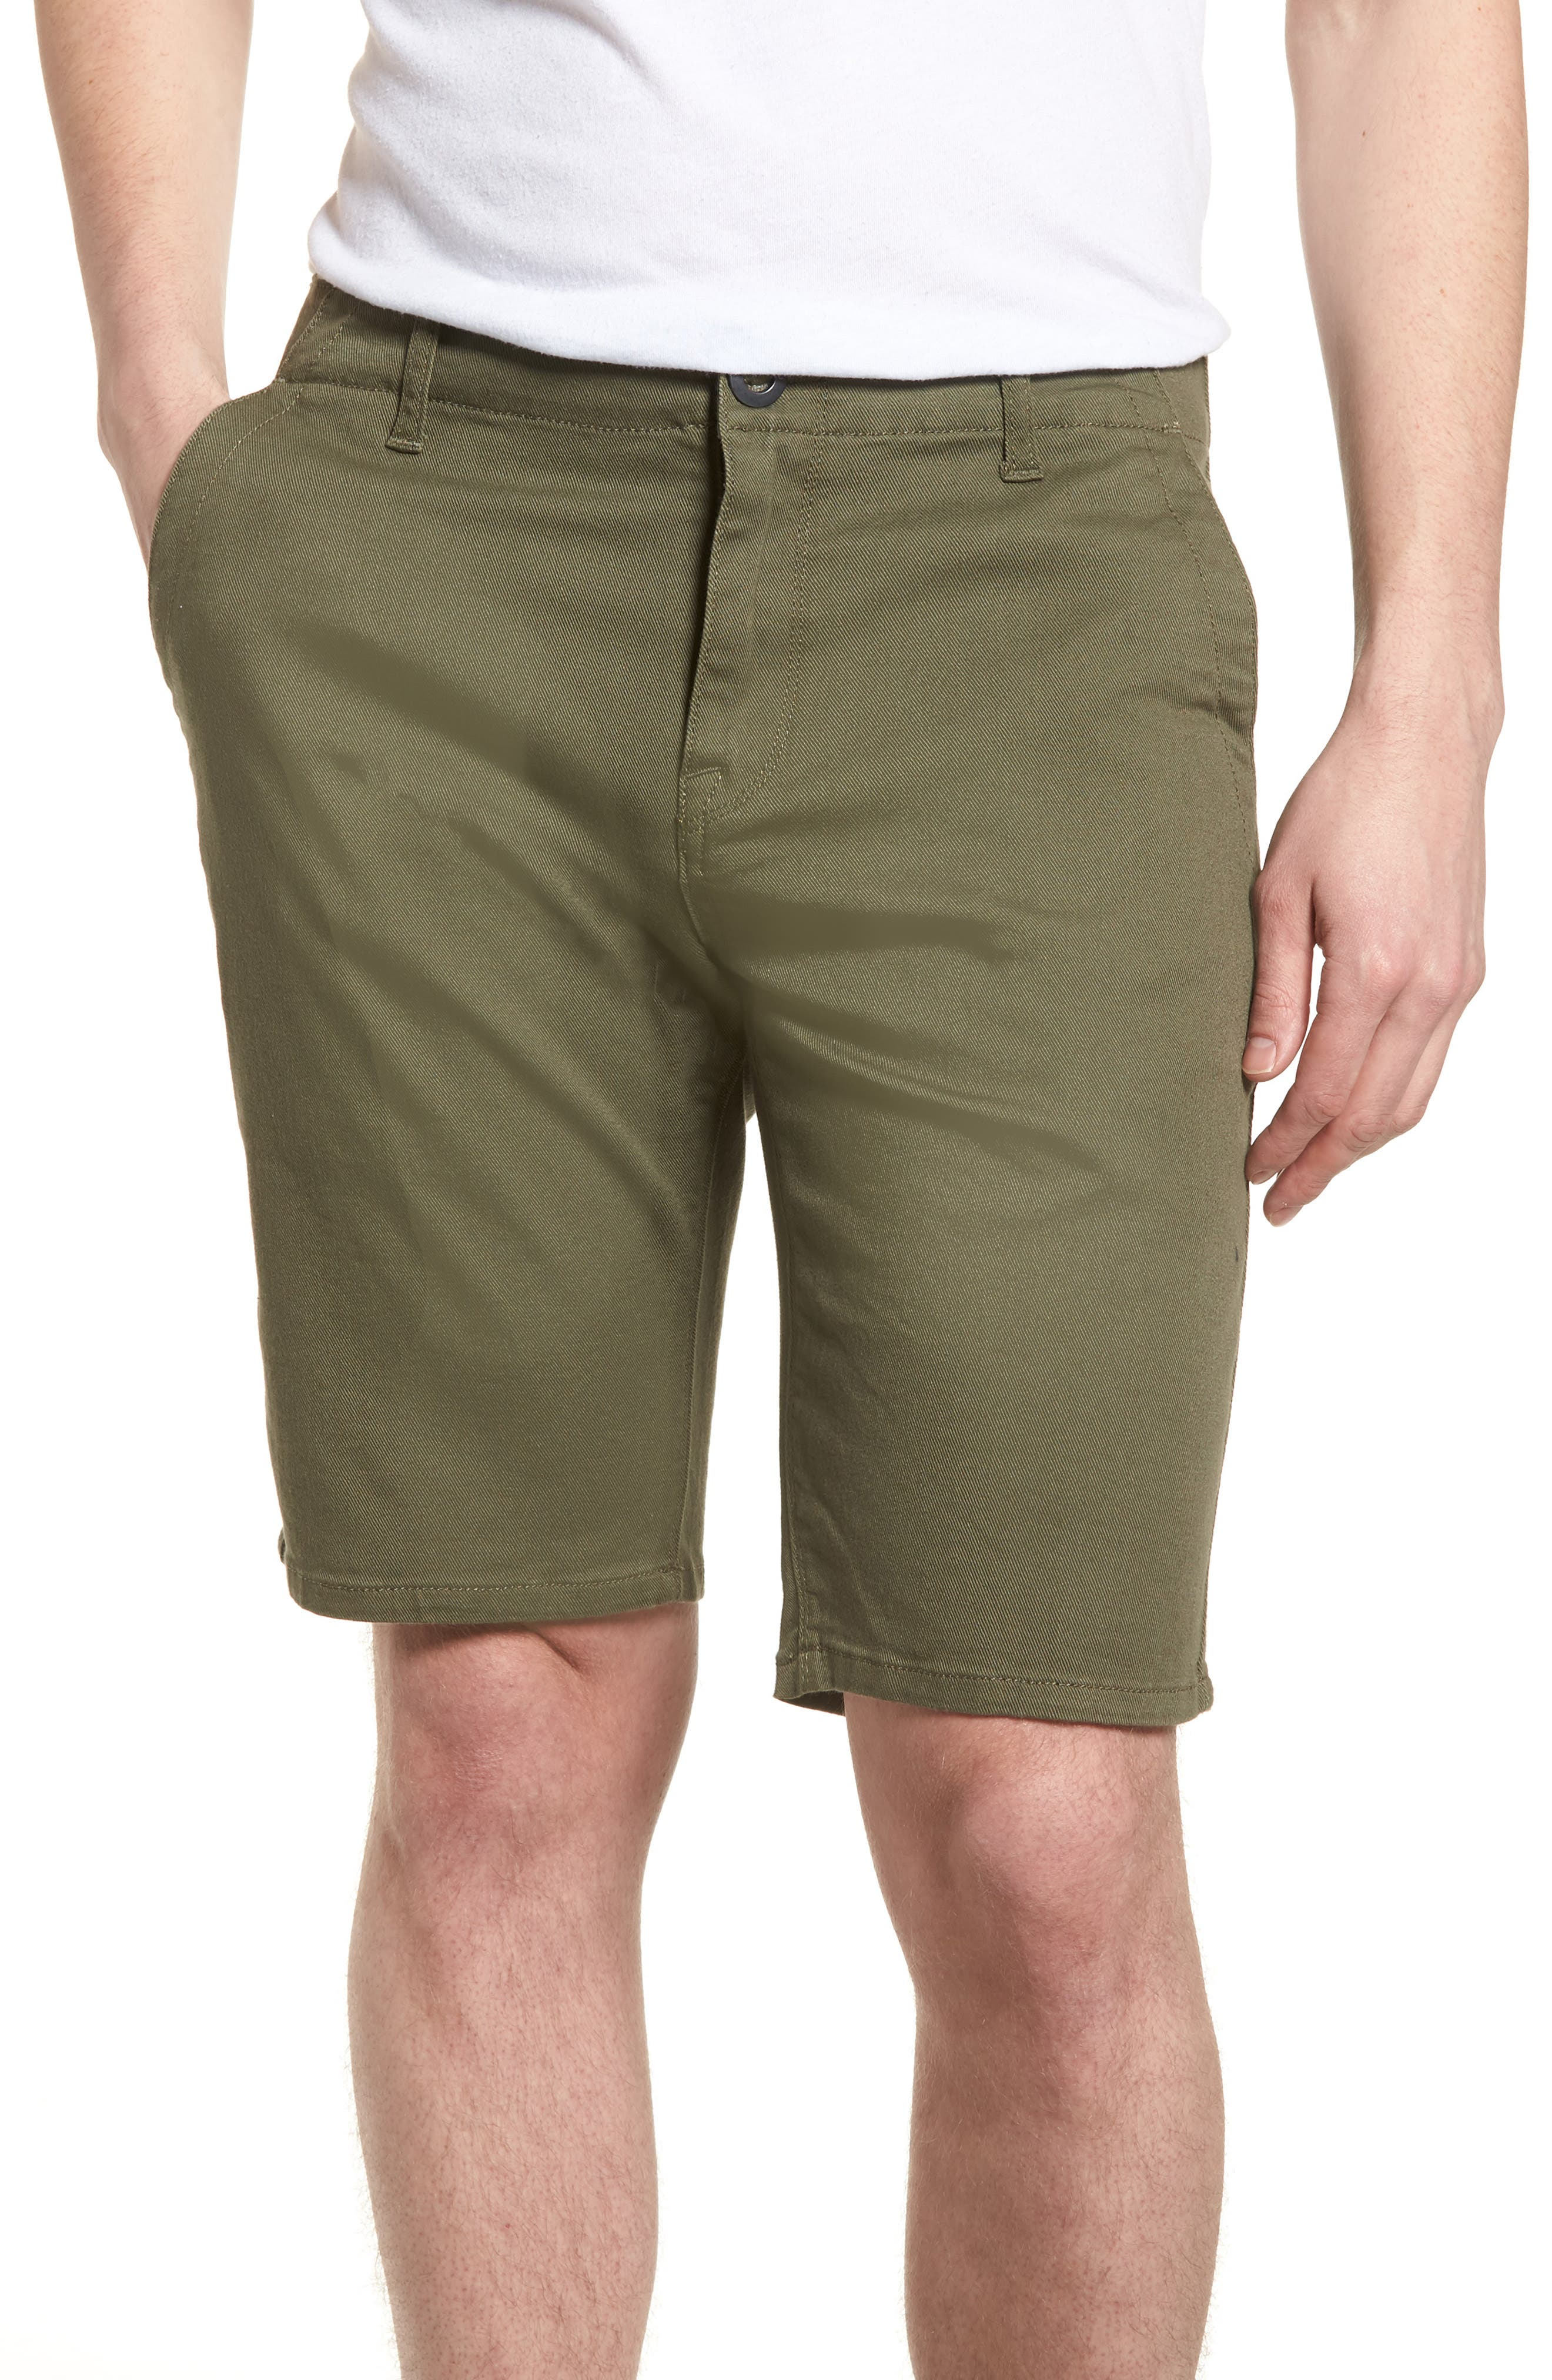 VSM Prowler Shorts,                         Main,                         color, Military